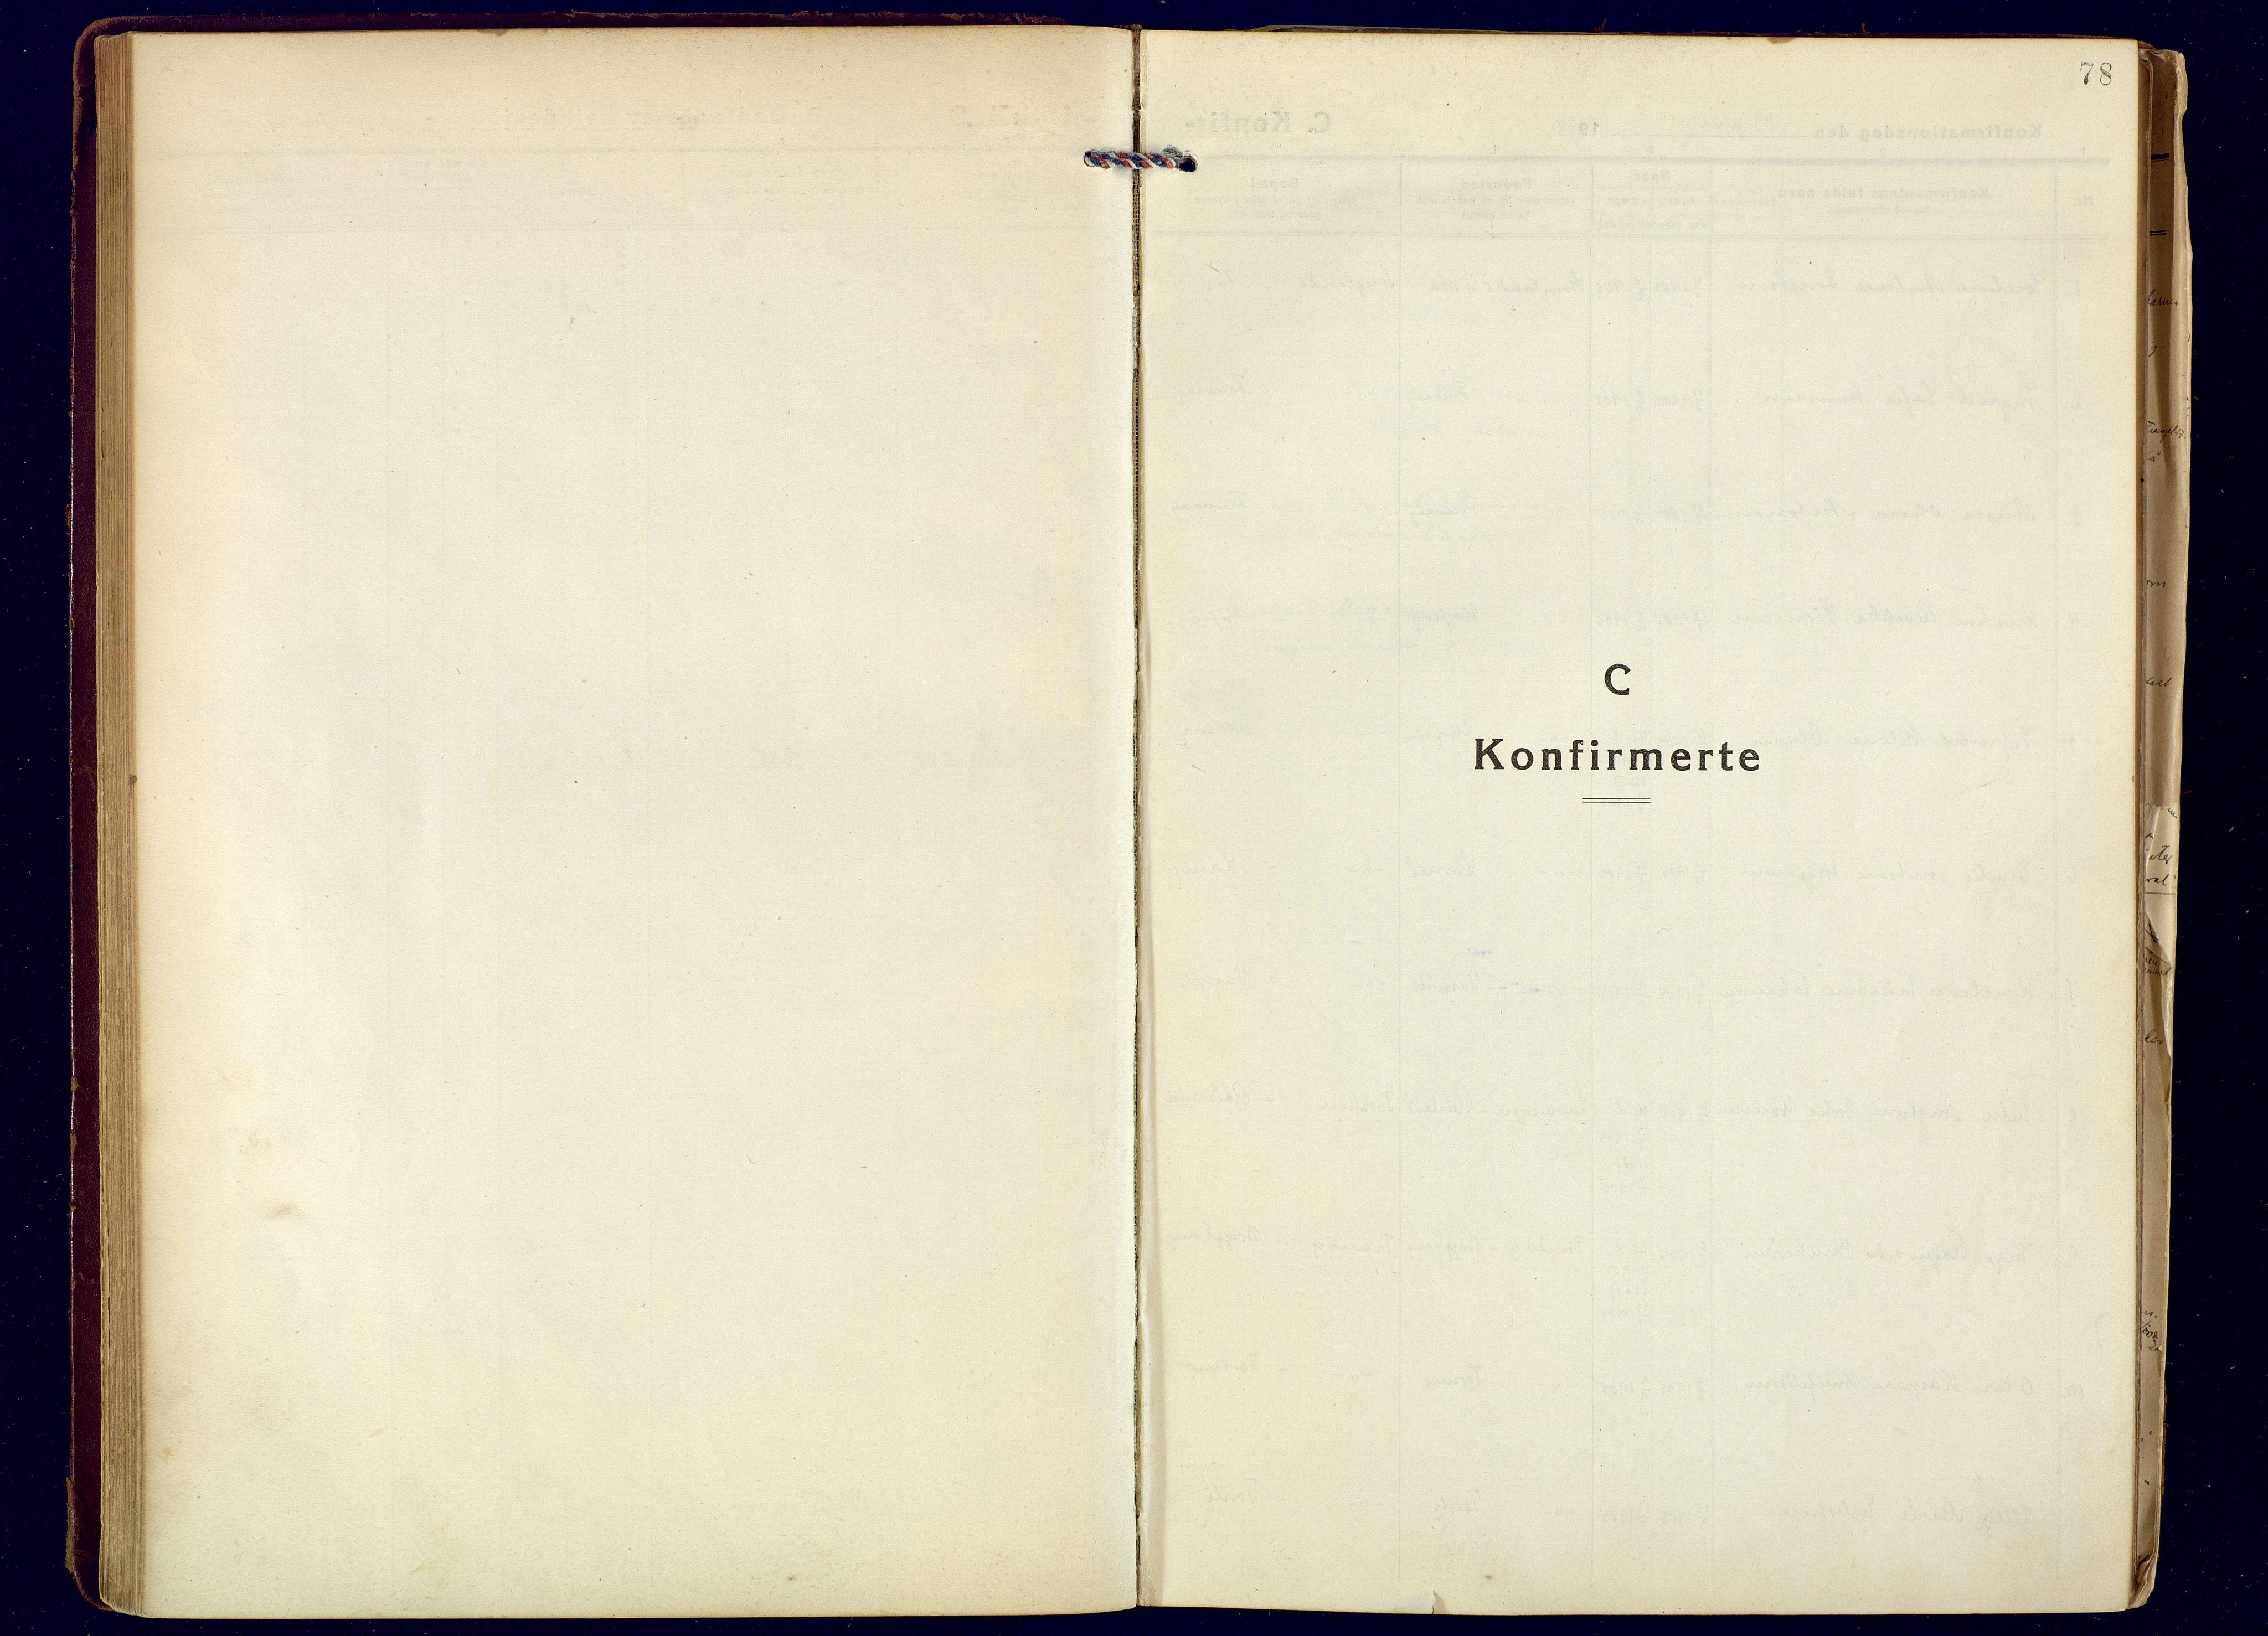 SATØ, Tranøy sokneprestkontor, I/Ia/Iaa: Parish register (official) no. 16, 1919-1932, p. 78